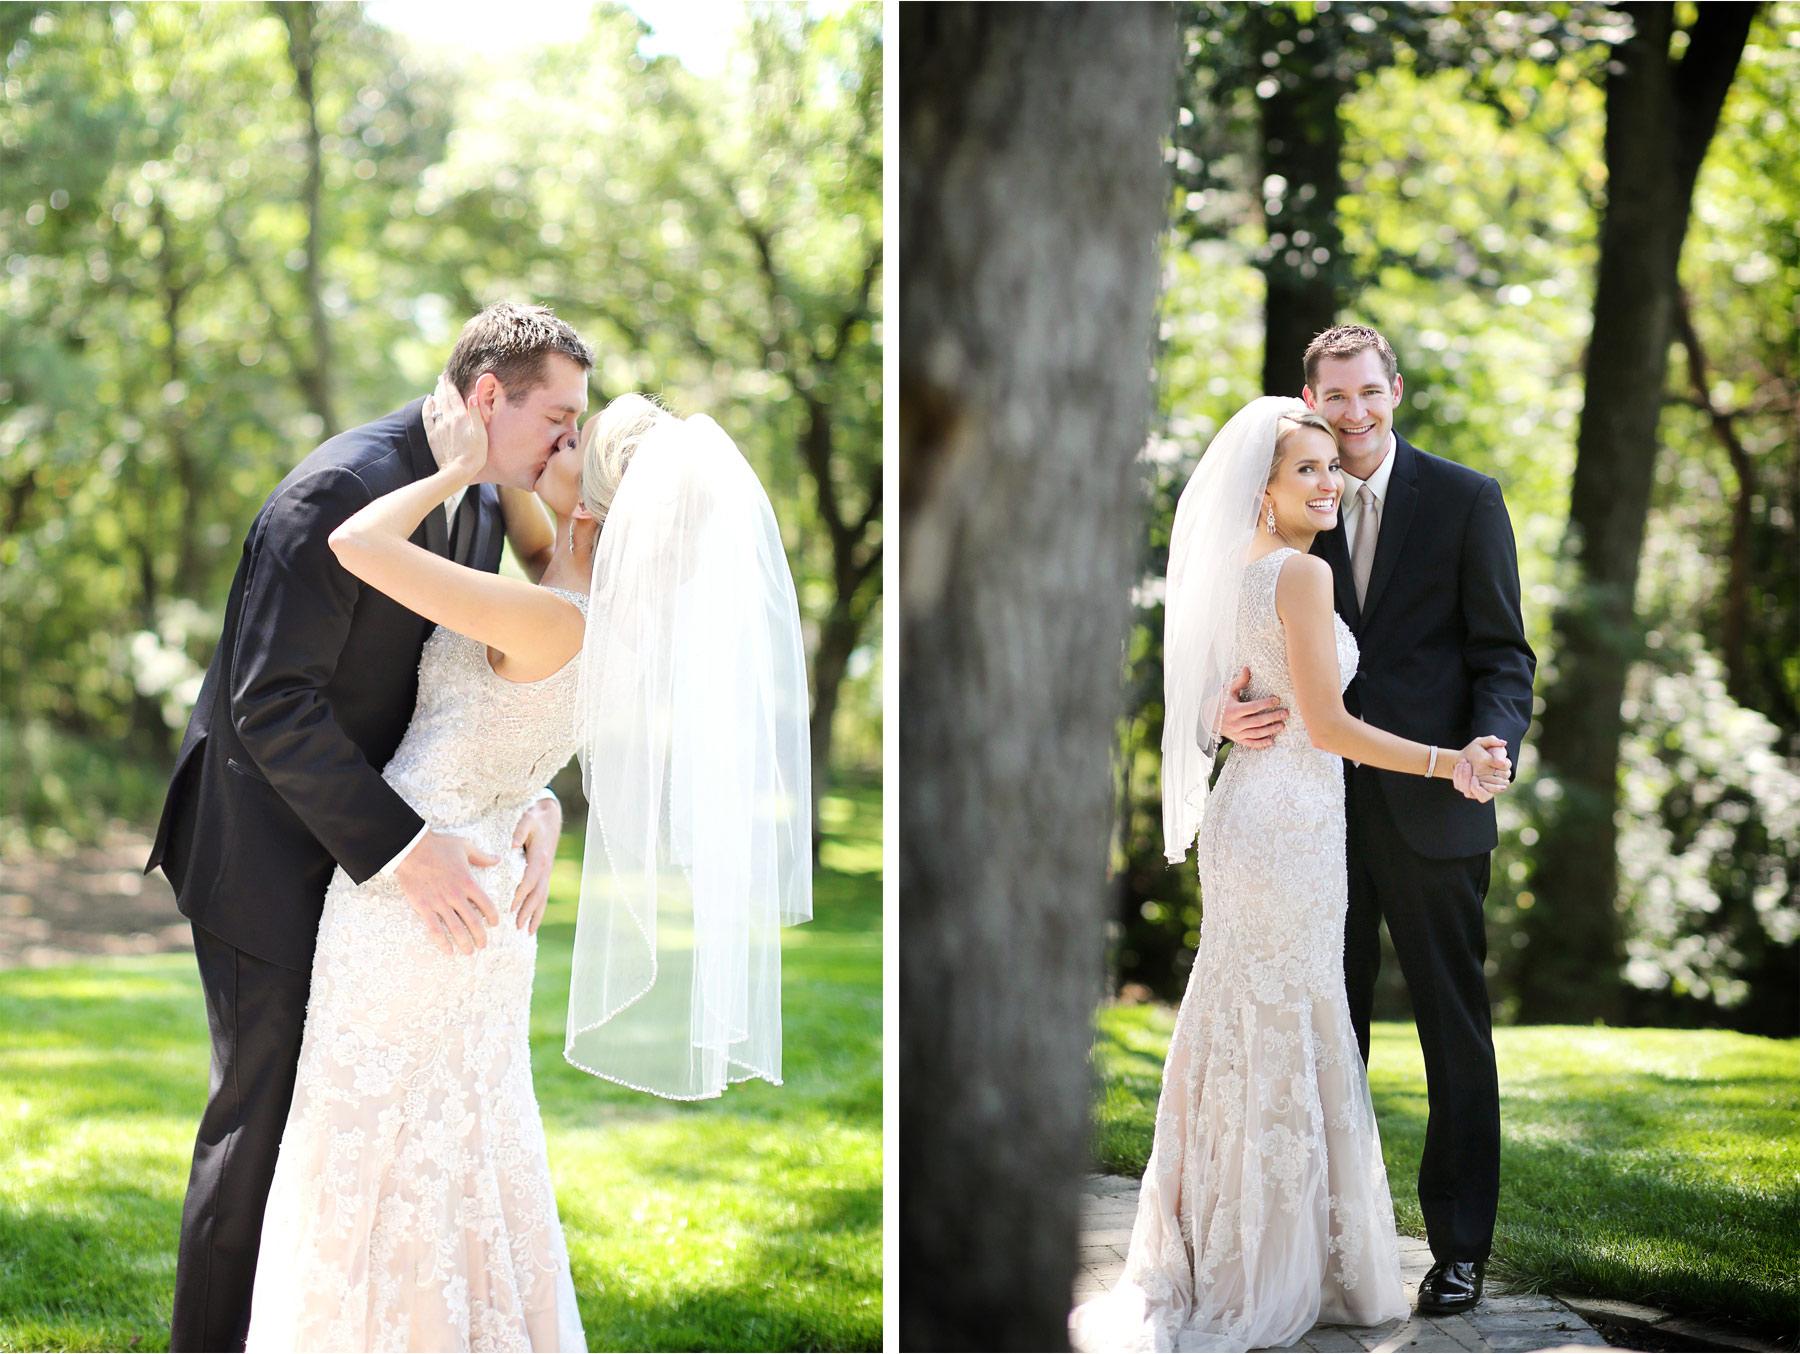 03-Minneapolis-Minnesota-Wedding-Photography-by-Vick-Photography-First-Look-Jenna-and-Josh.jpg